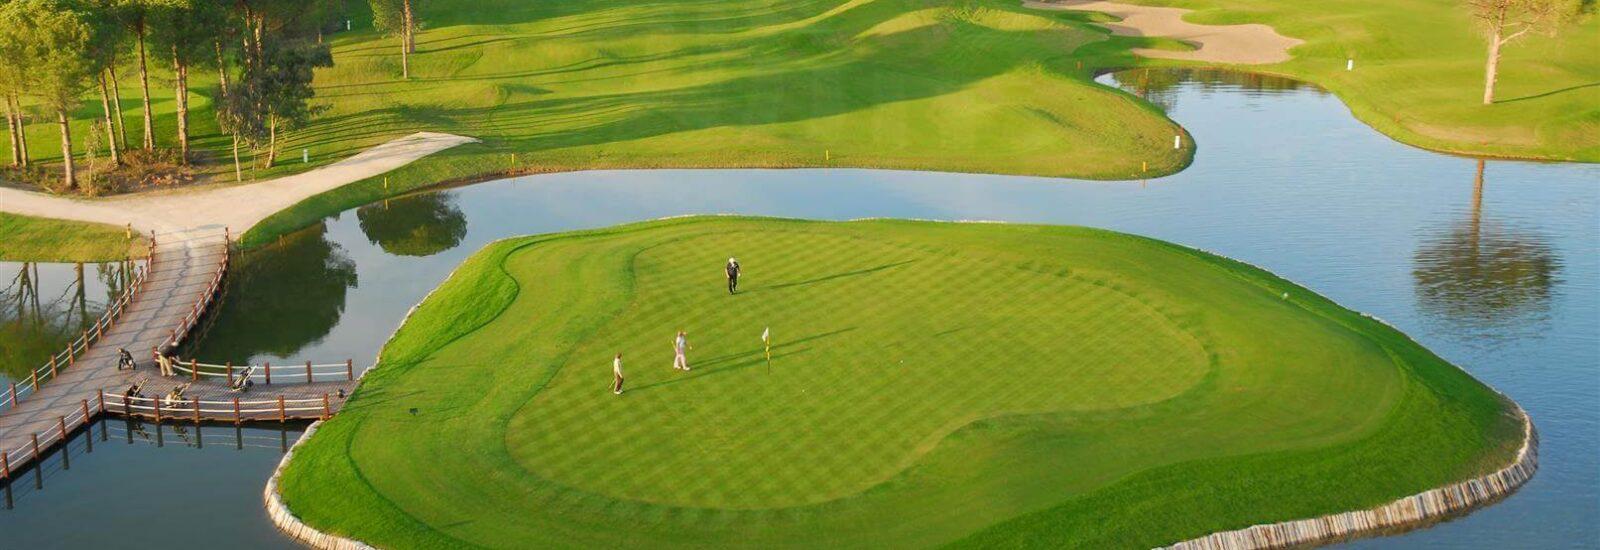 Sueno Dunes Golf Course